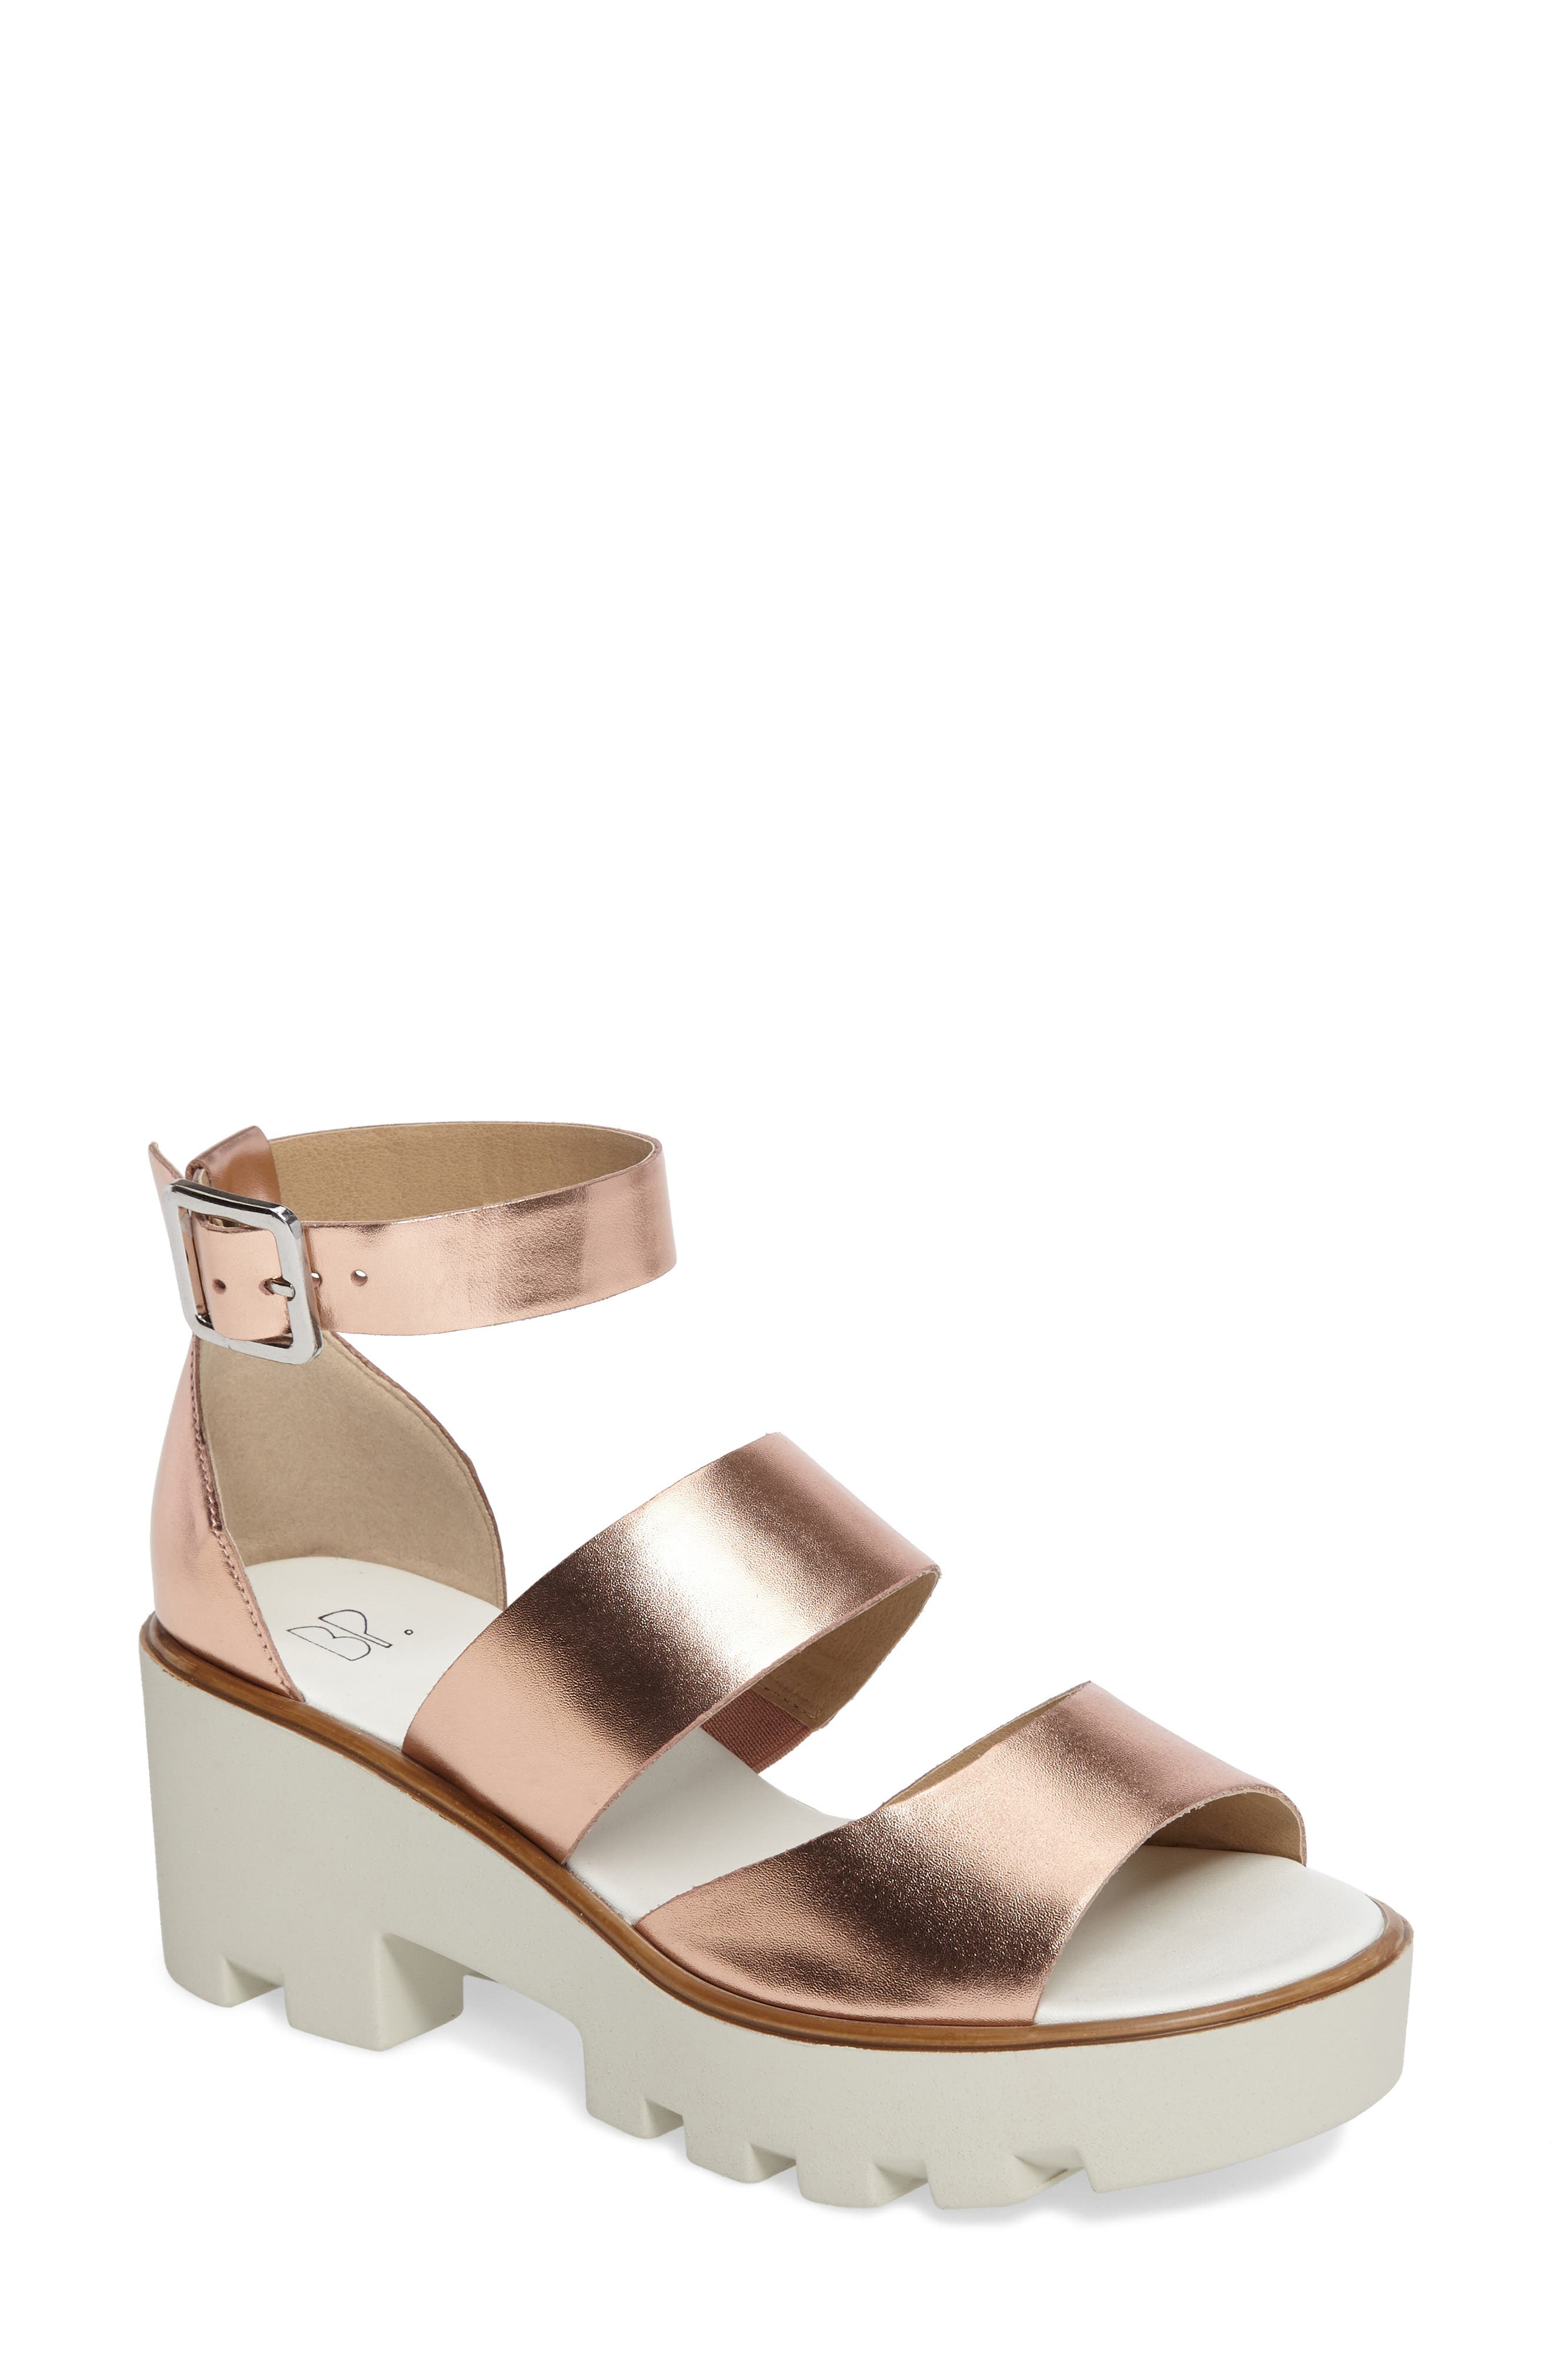 Rowan Platform Sandal,                             Main thumbnail 1, color,                             Rose Gold Leather